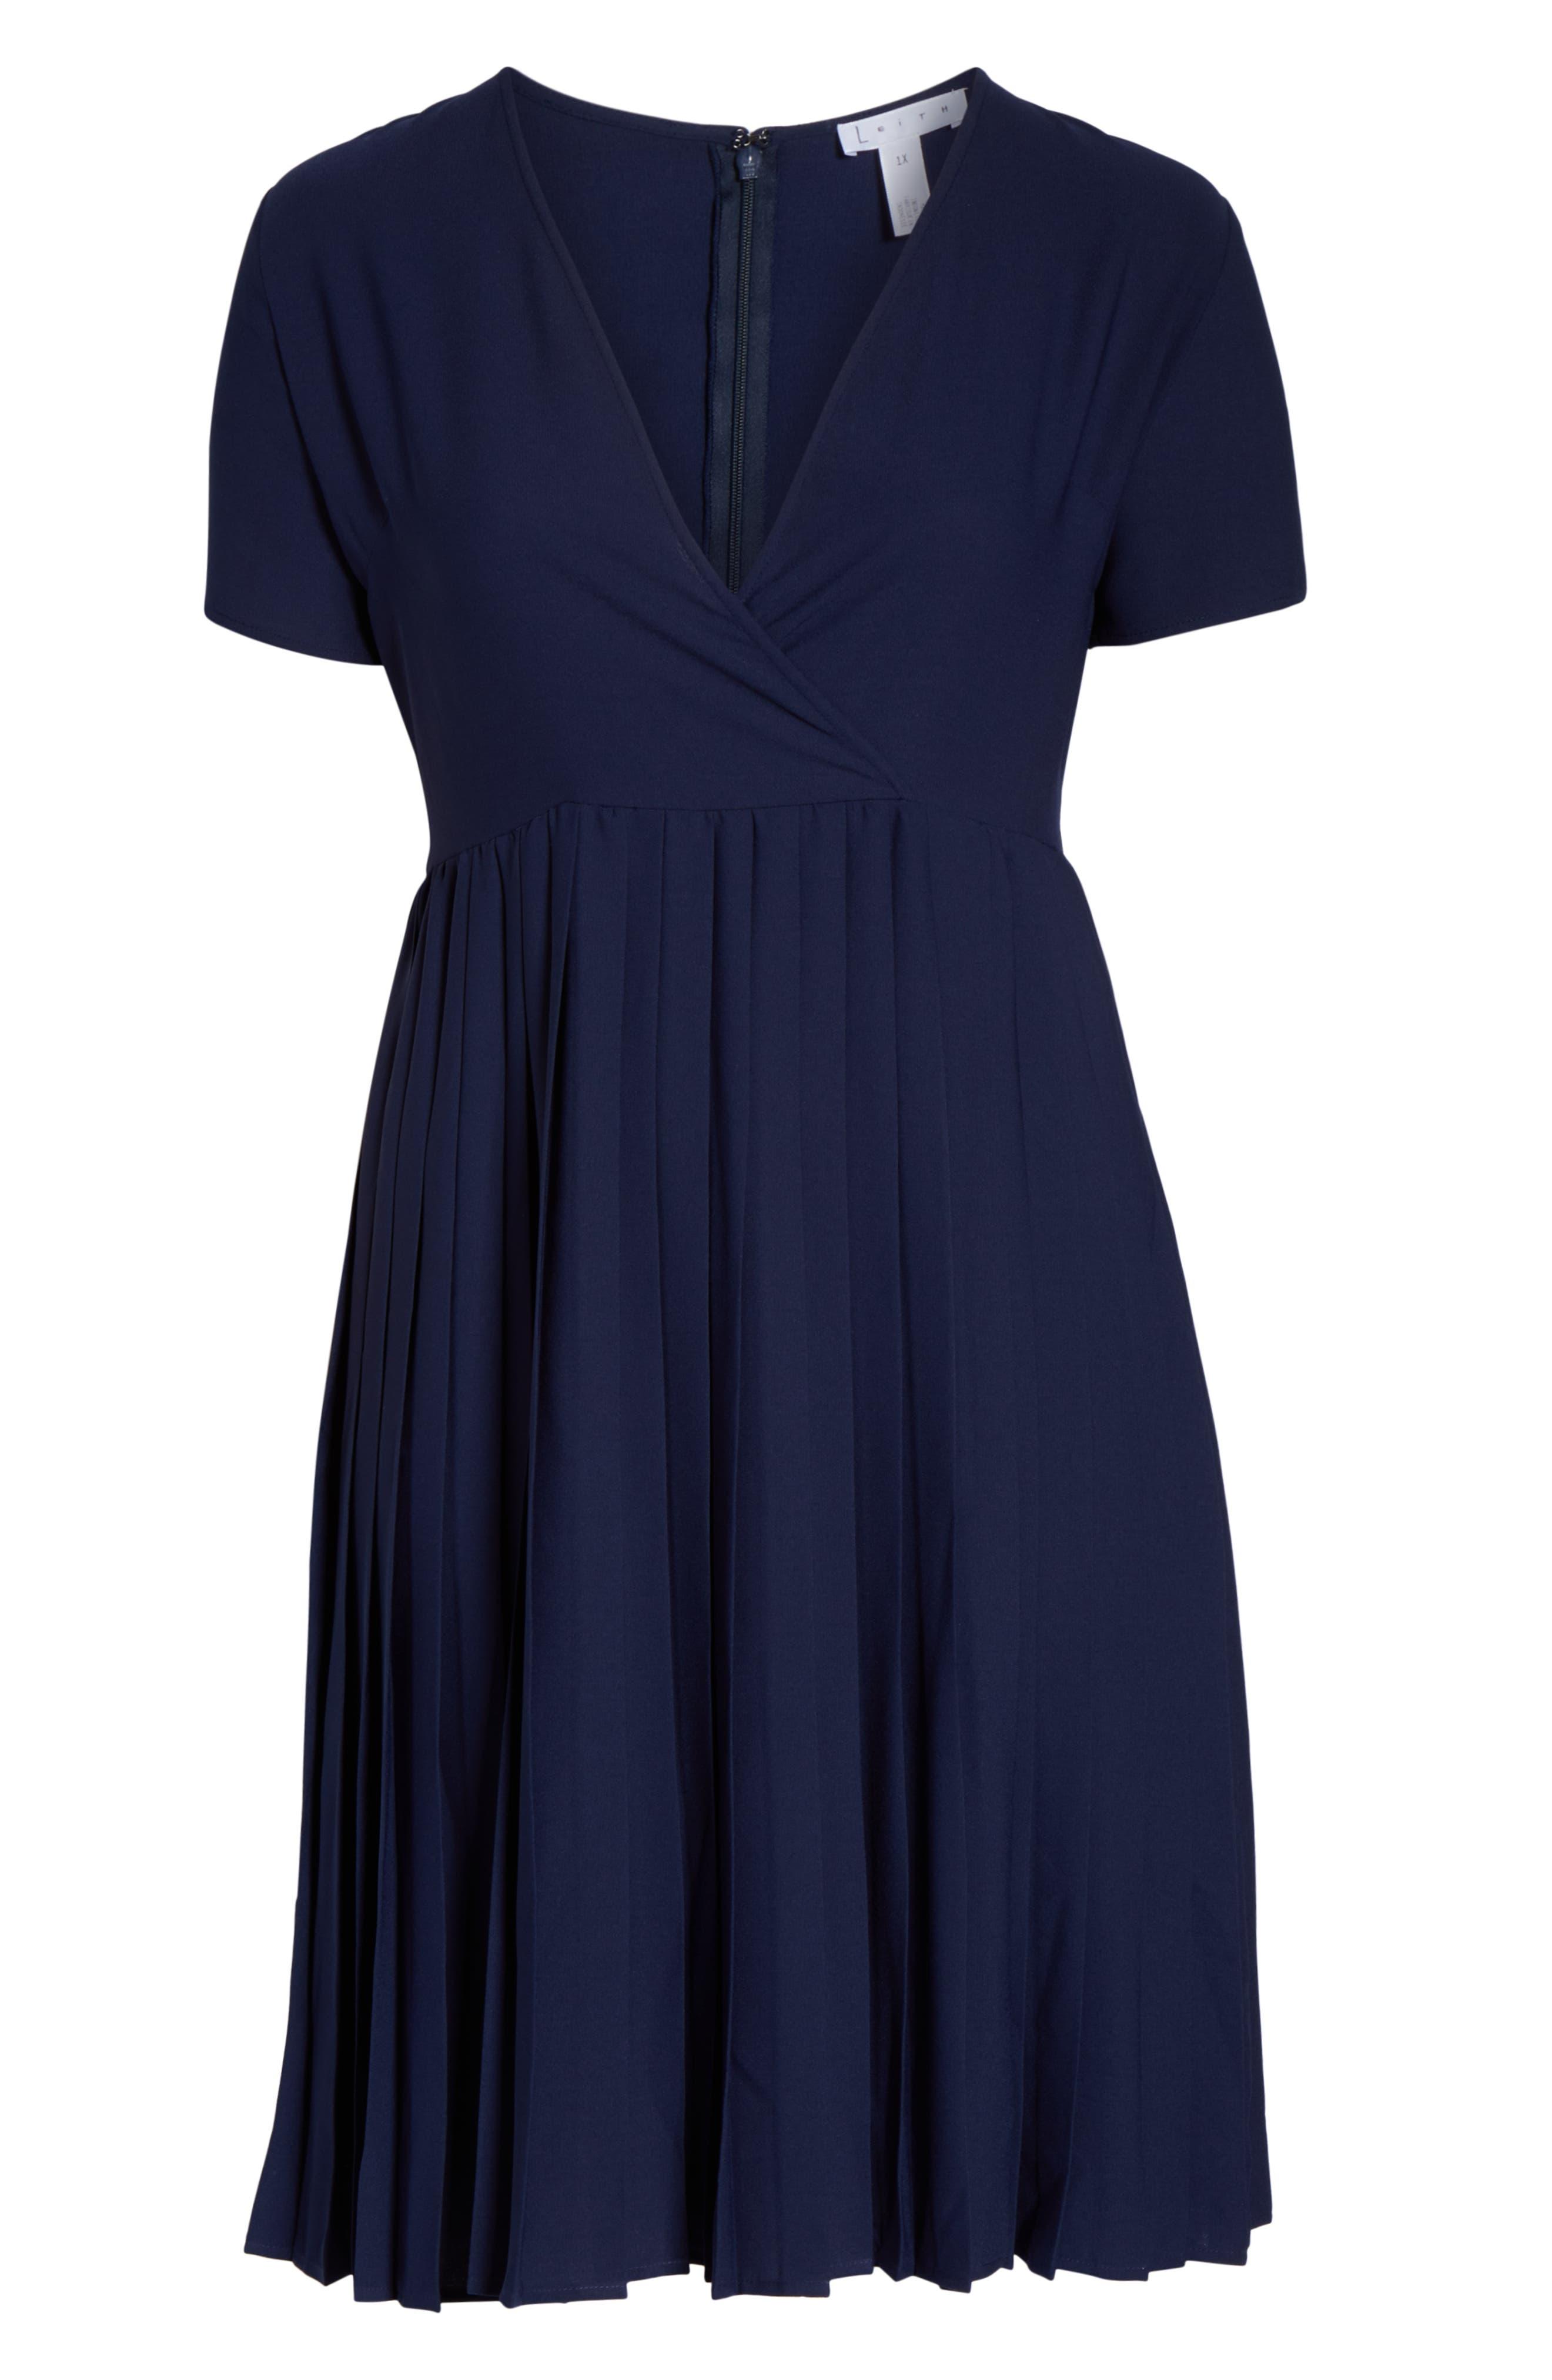 LEITH,                             Pleated Surplice Dress,                             Alternate thumbnail 13, color,                             NAVY PEACOAT